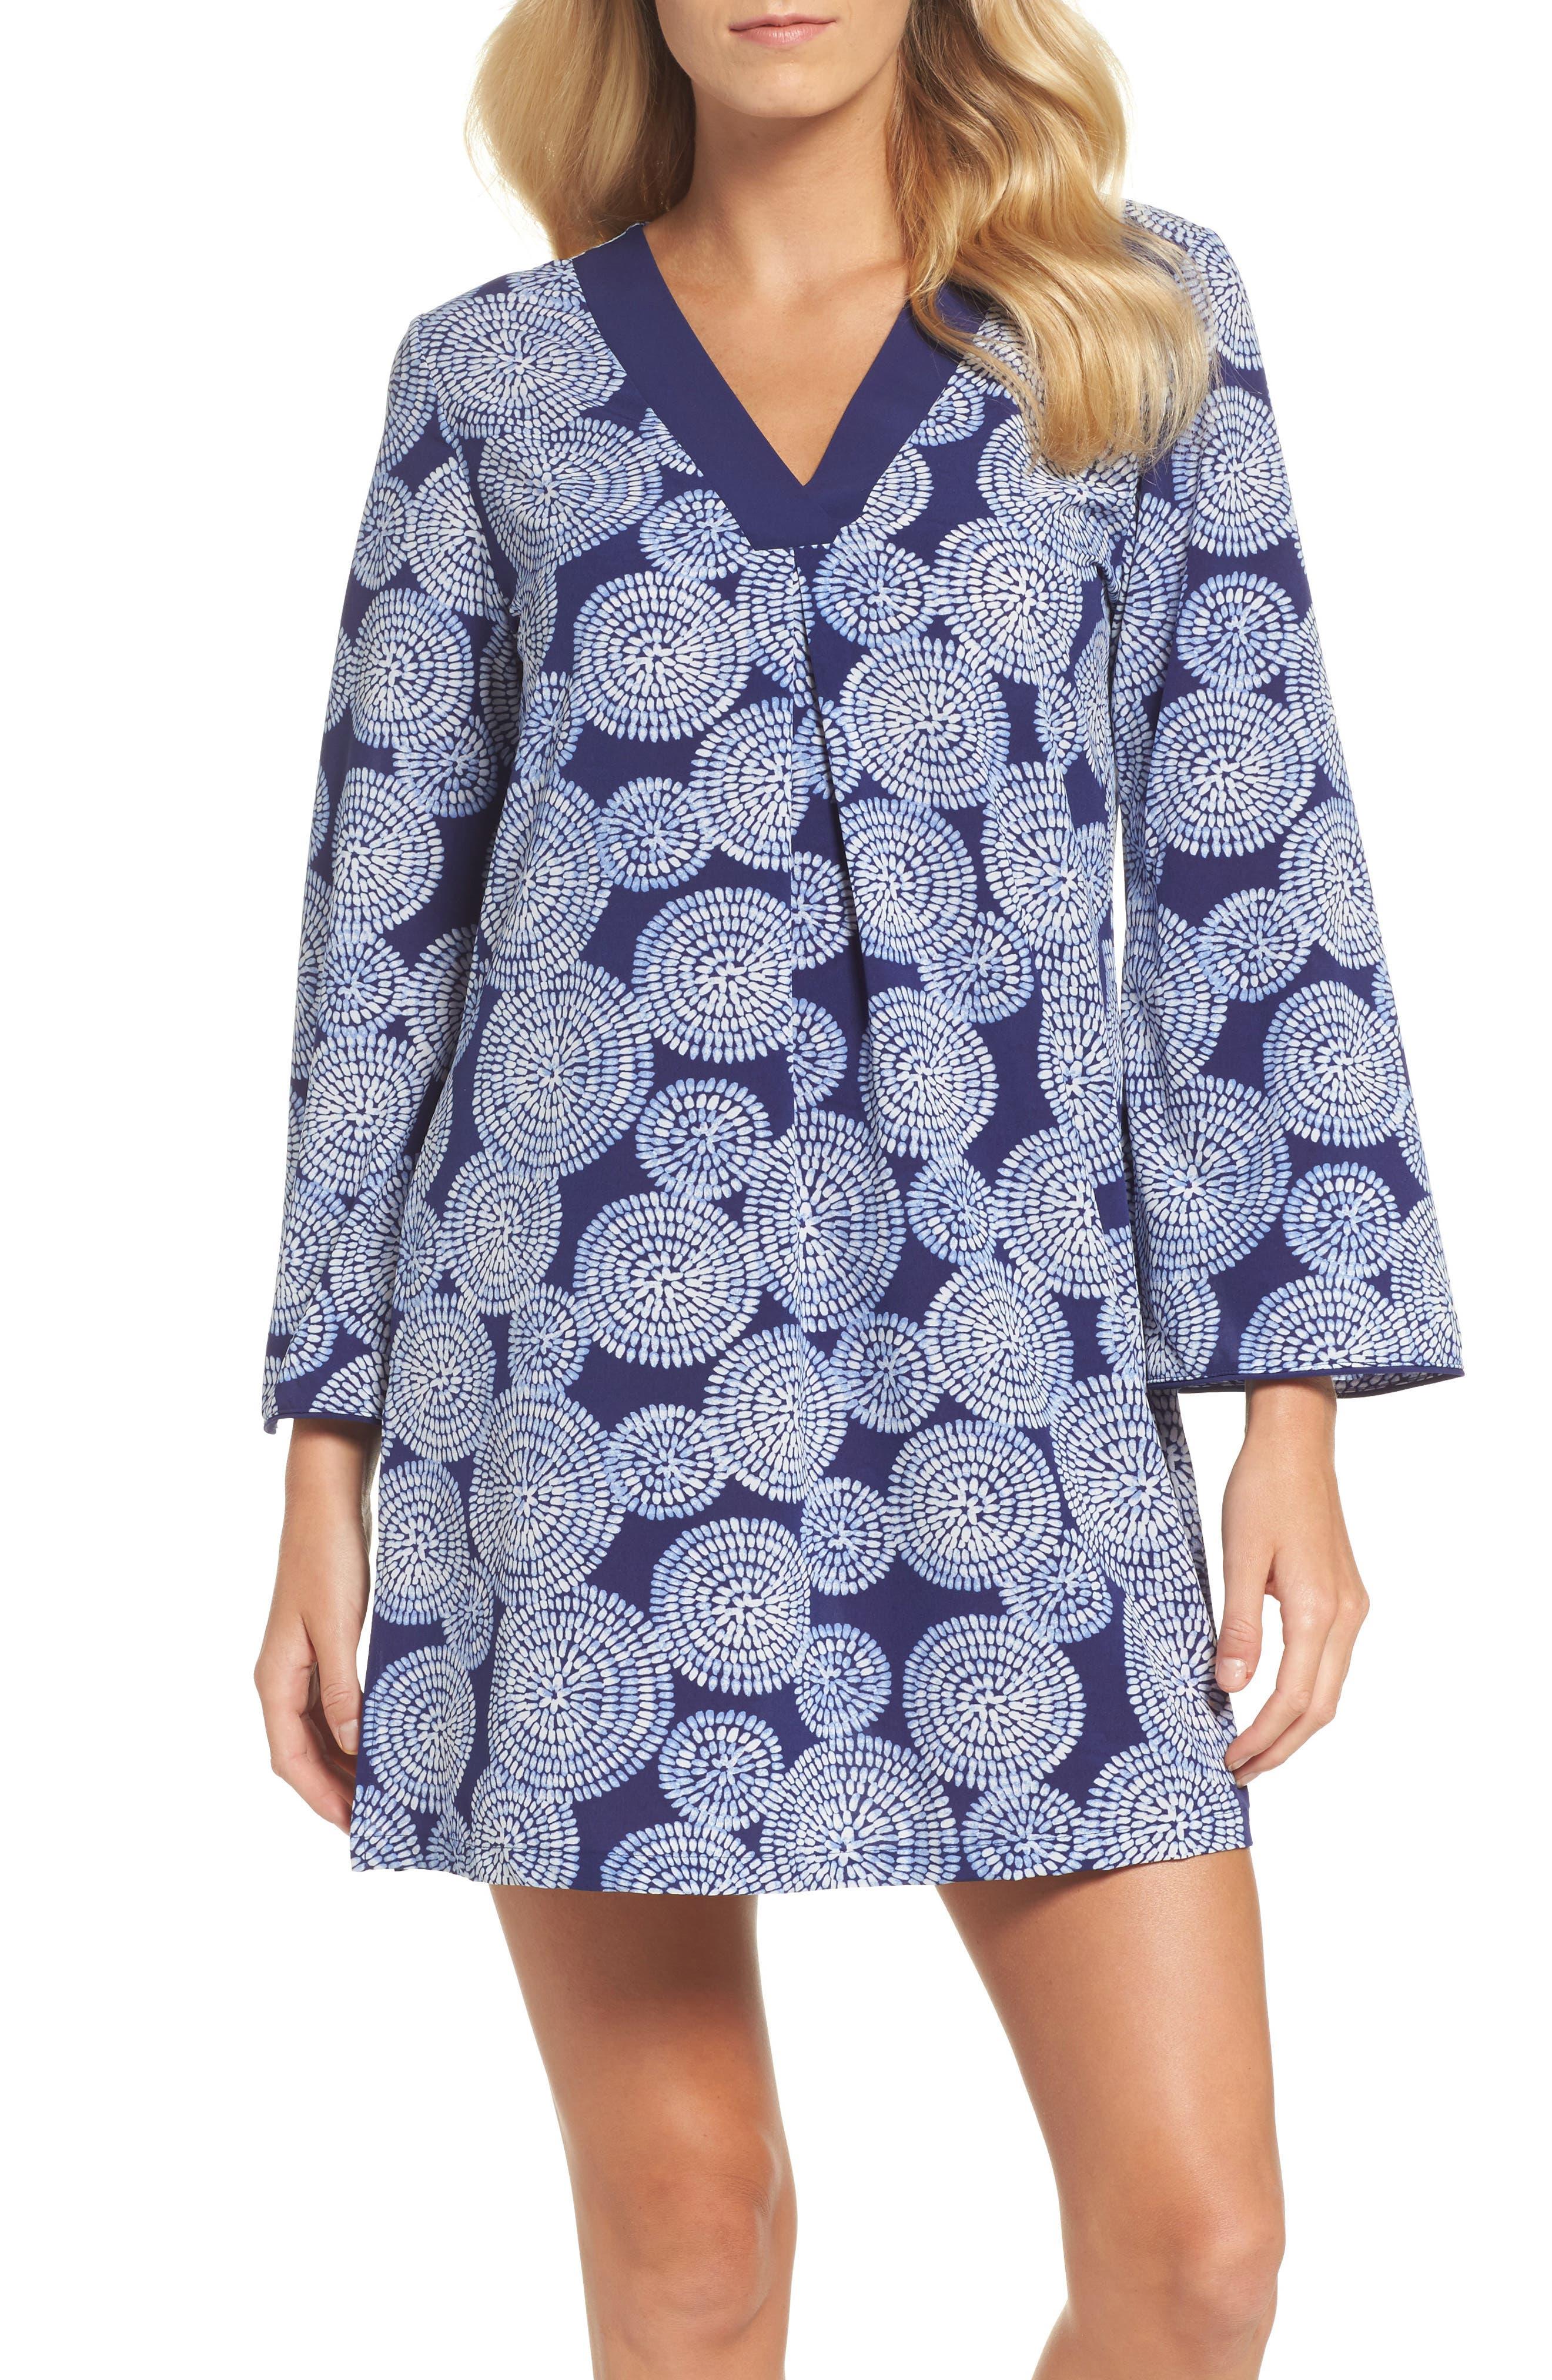 Sleepwear Halftan Short Nightgown,                             Main thumbnail 1, color,                             498